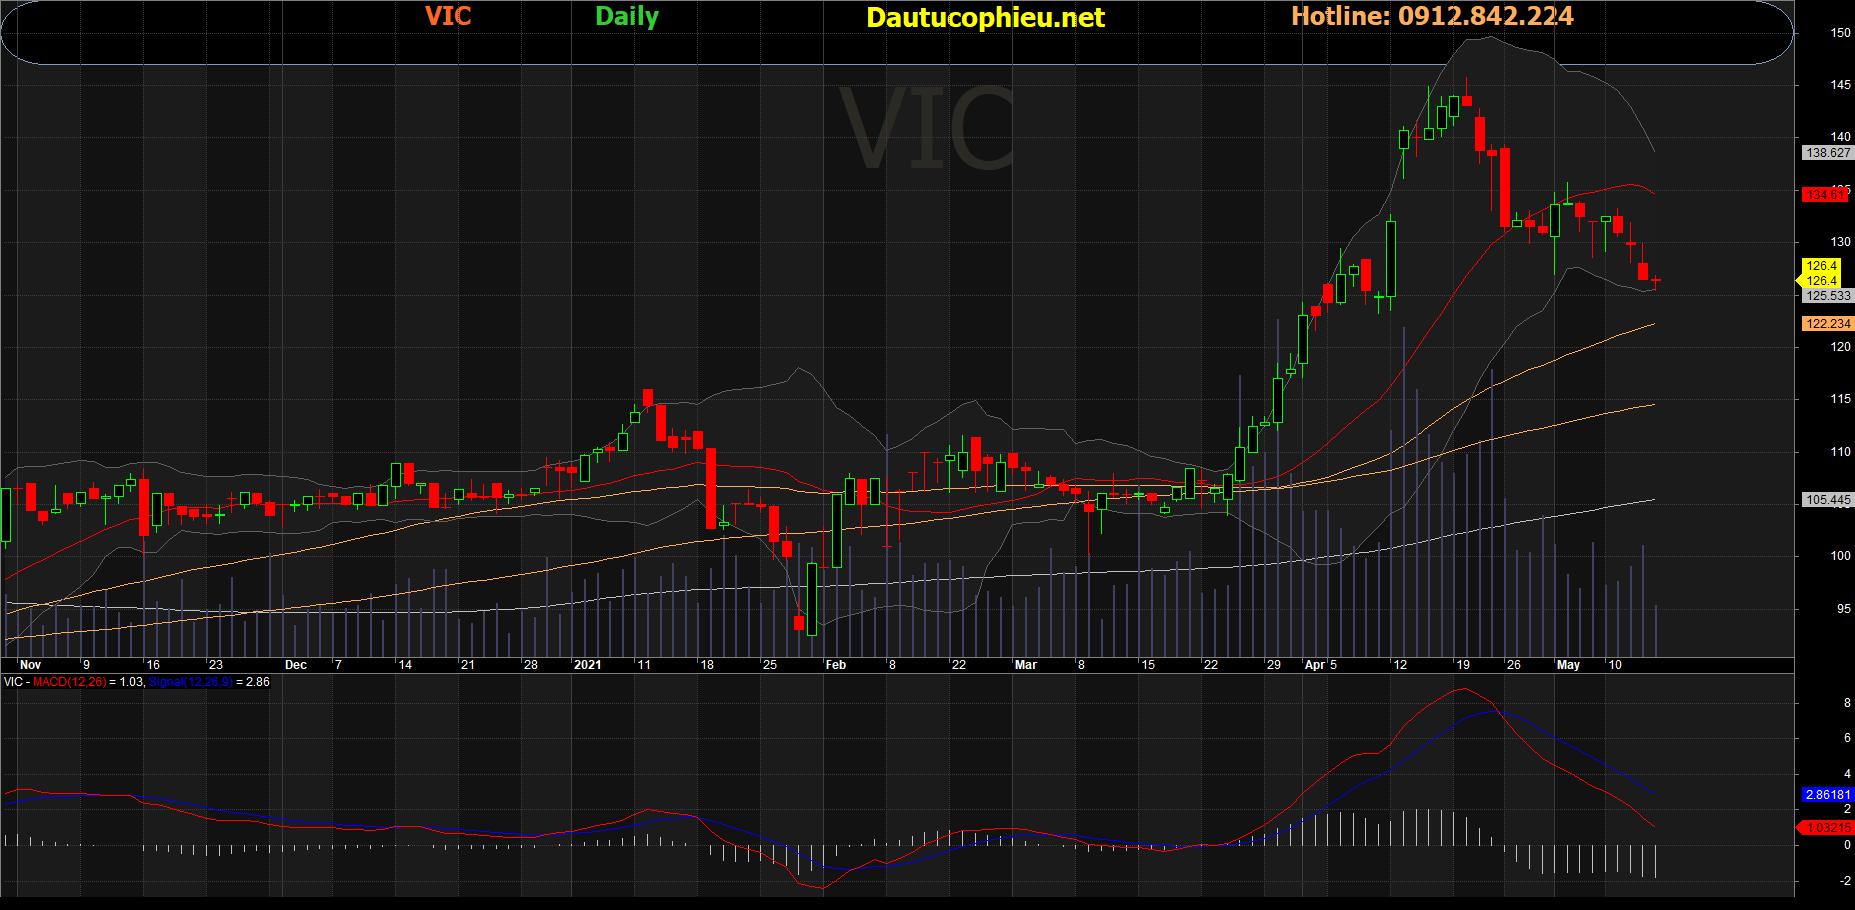 Cổ phiếu VIC